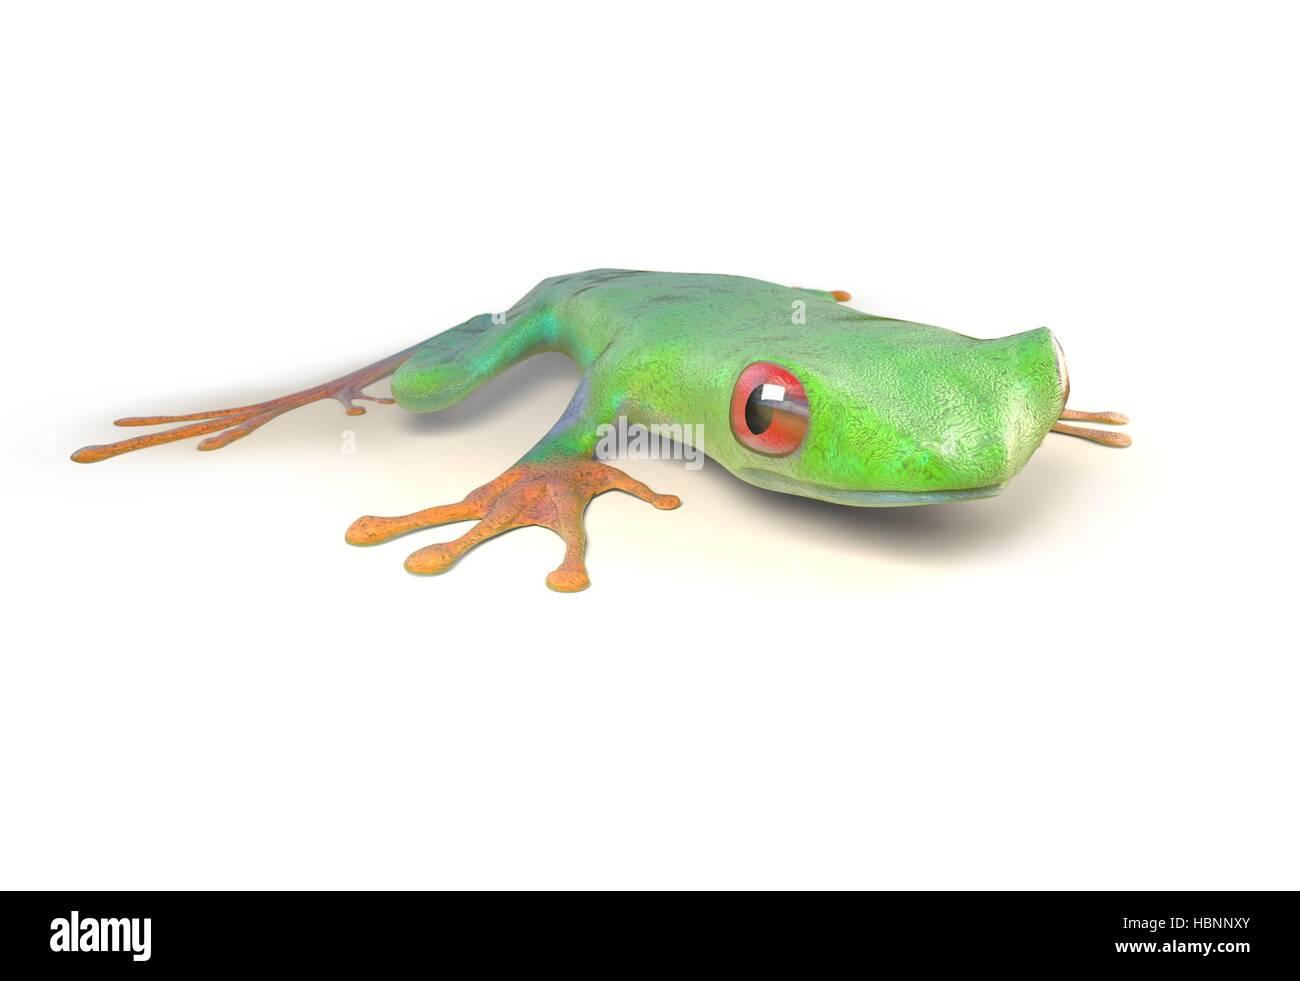 Cartoon Frog Imágenes De Stock & Cartoon Frog Fotos De Stock ...